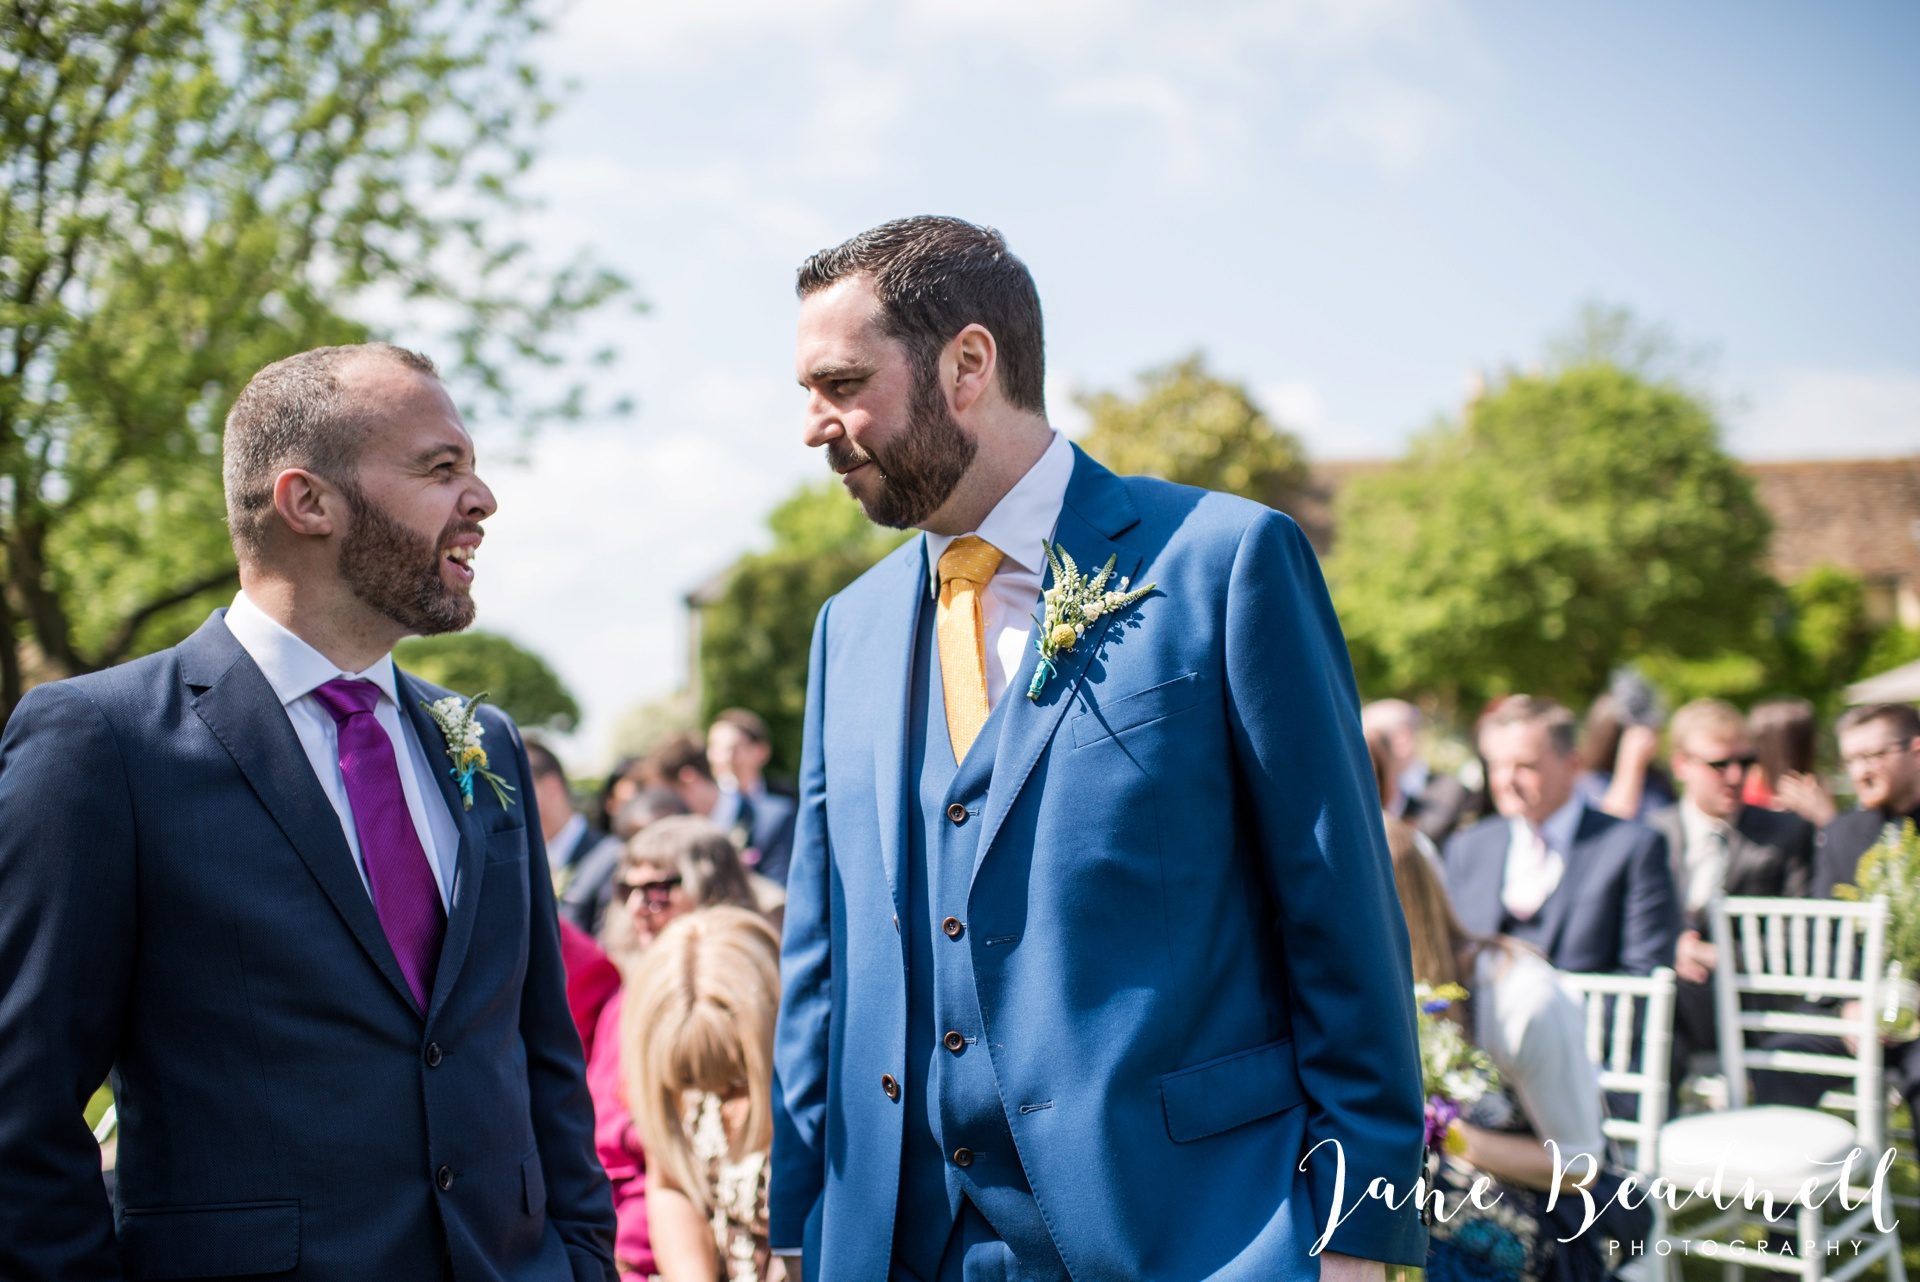 South Farm Wedding photography Hertfordshire by Jane Beadnell Photography fine art wedding photographer_0050